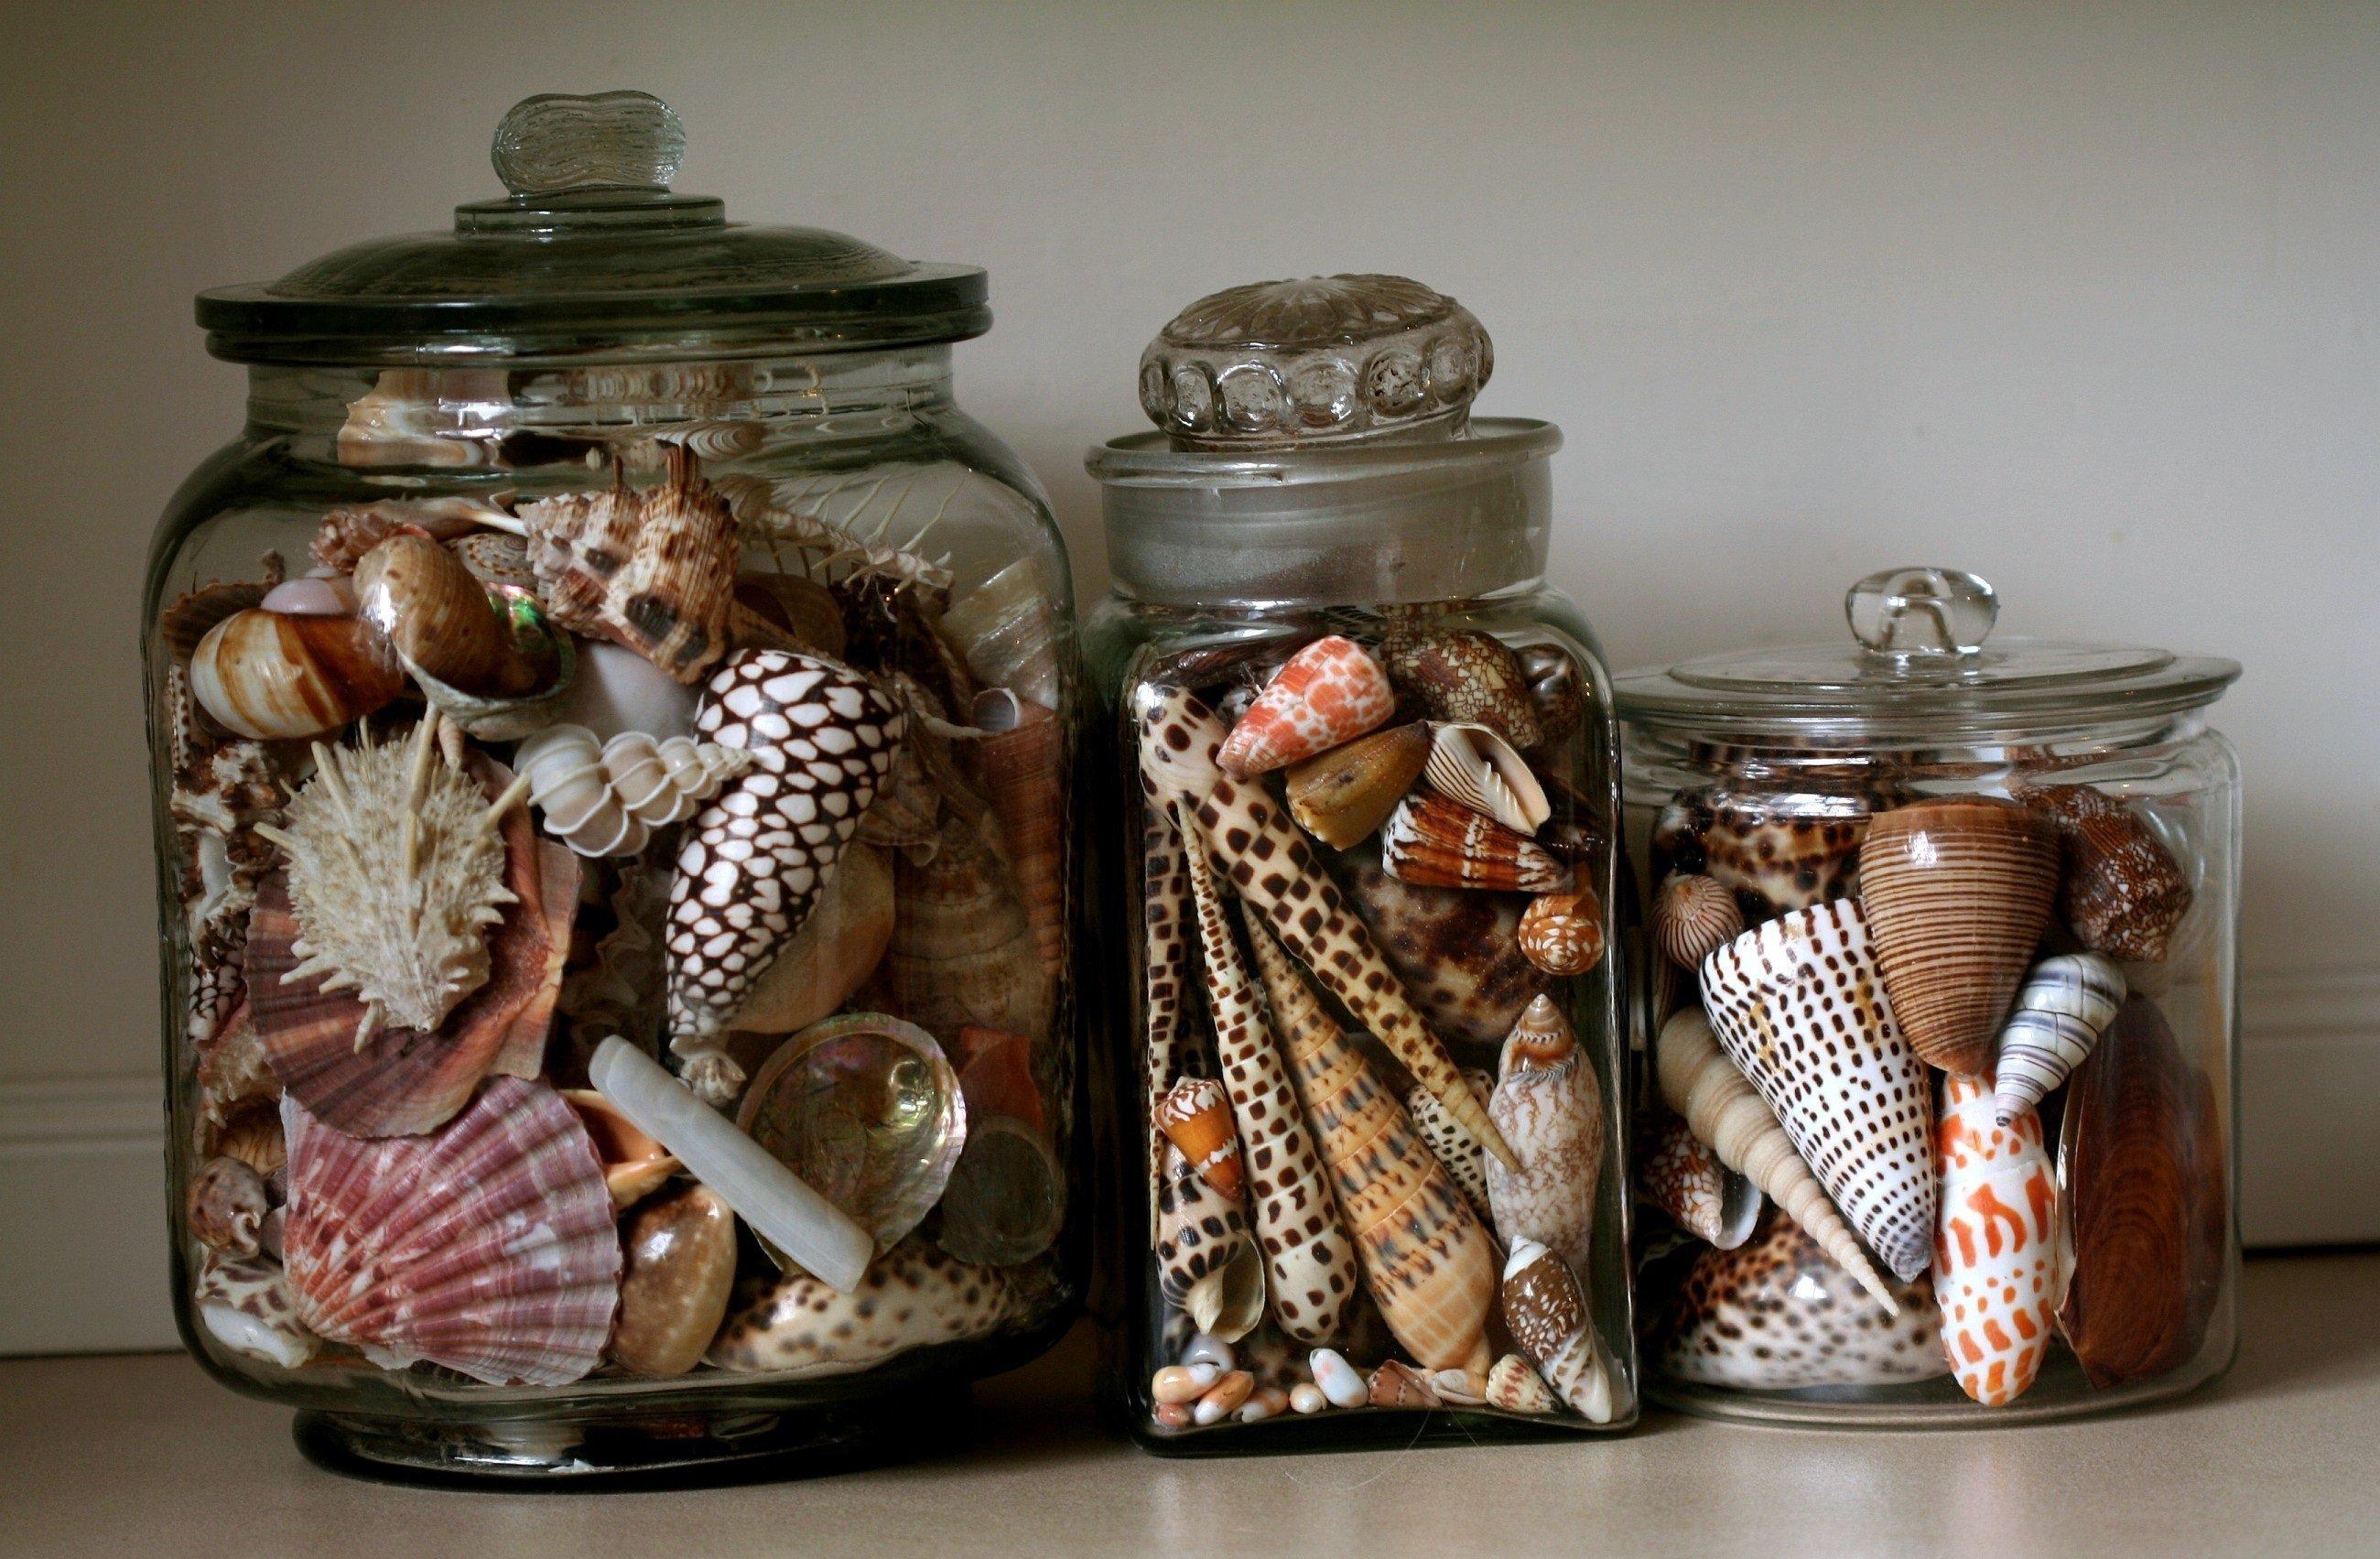 rakushki v interere49 - Идеи для декора в морском стиле